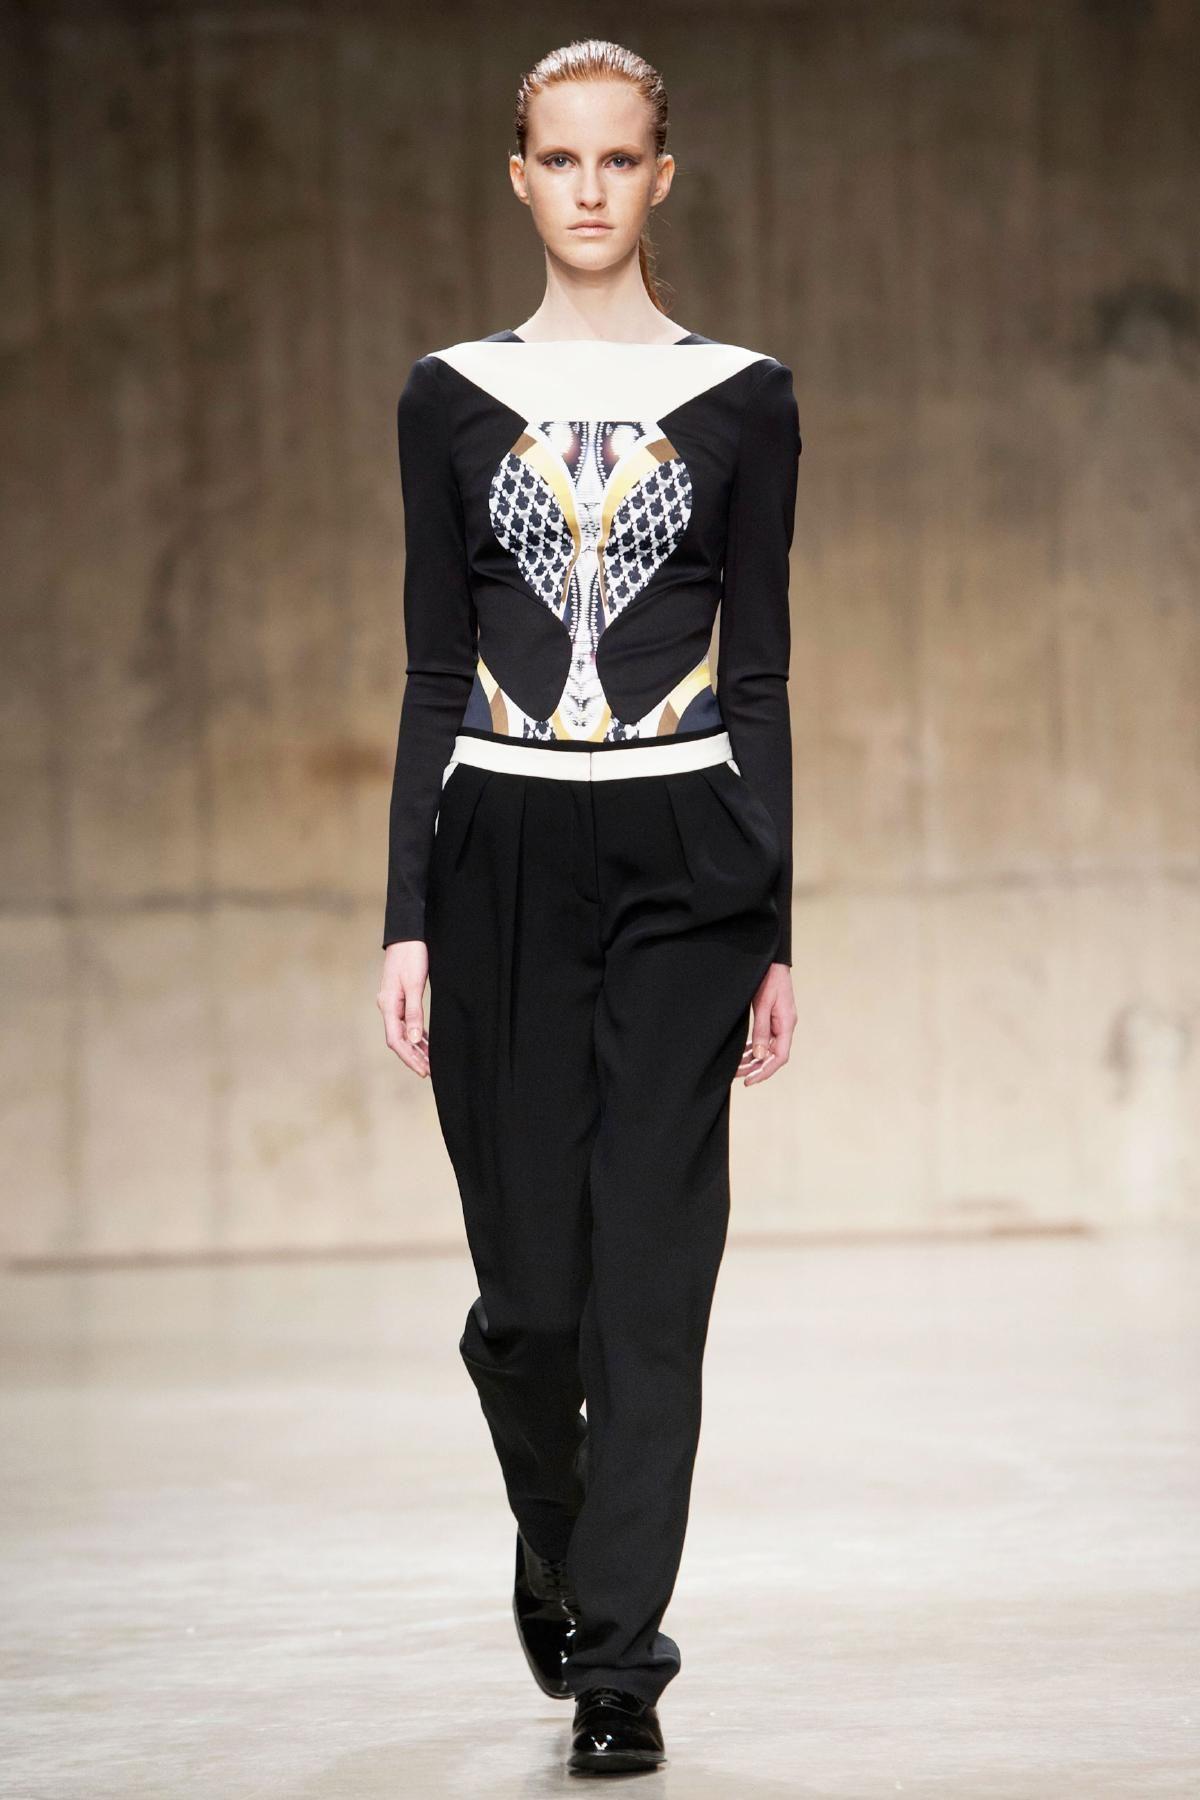 Peter Pilotto Fall 2013 RTW Collection - Fashion on TheCut